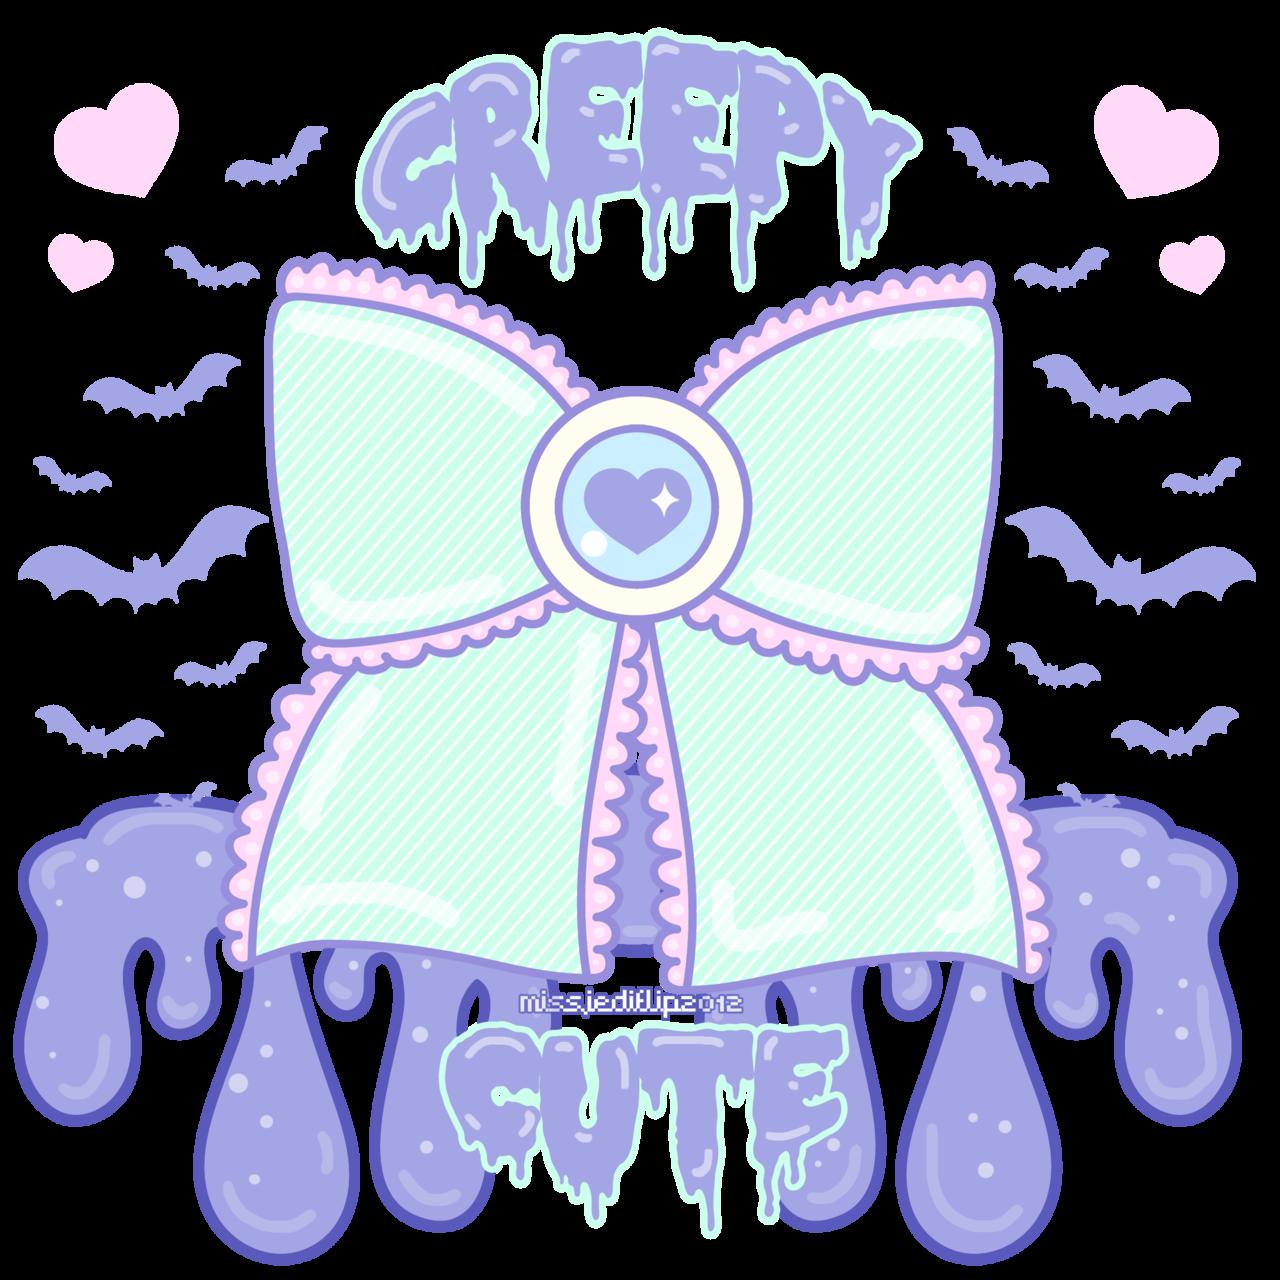 Creepy Cute By Missjediflip On Deviantart Goth Wallpaper Creepy Cute Pastel Goth Art